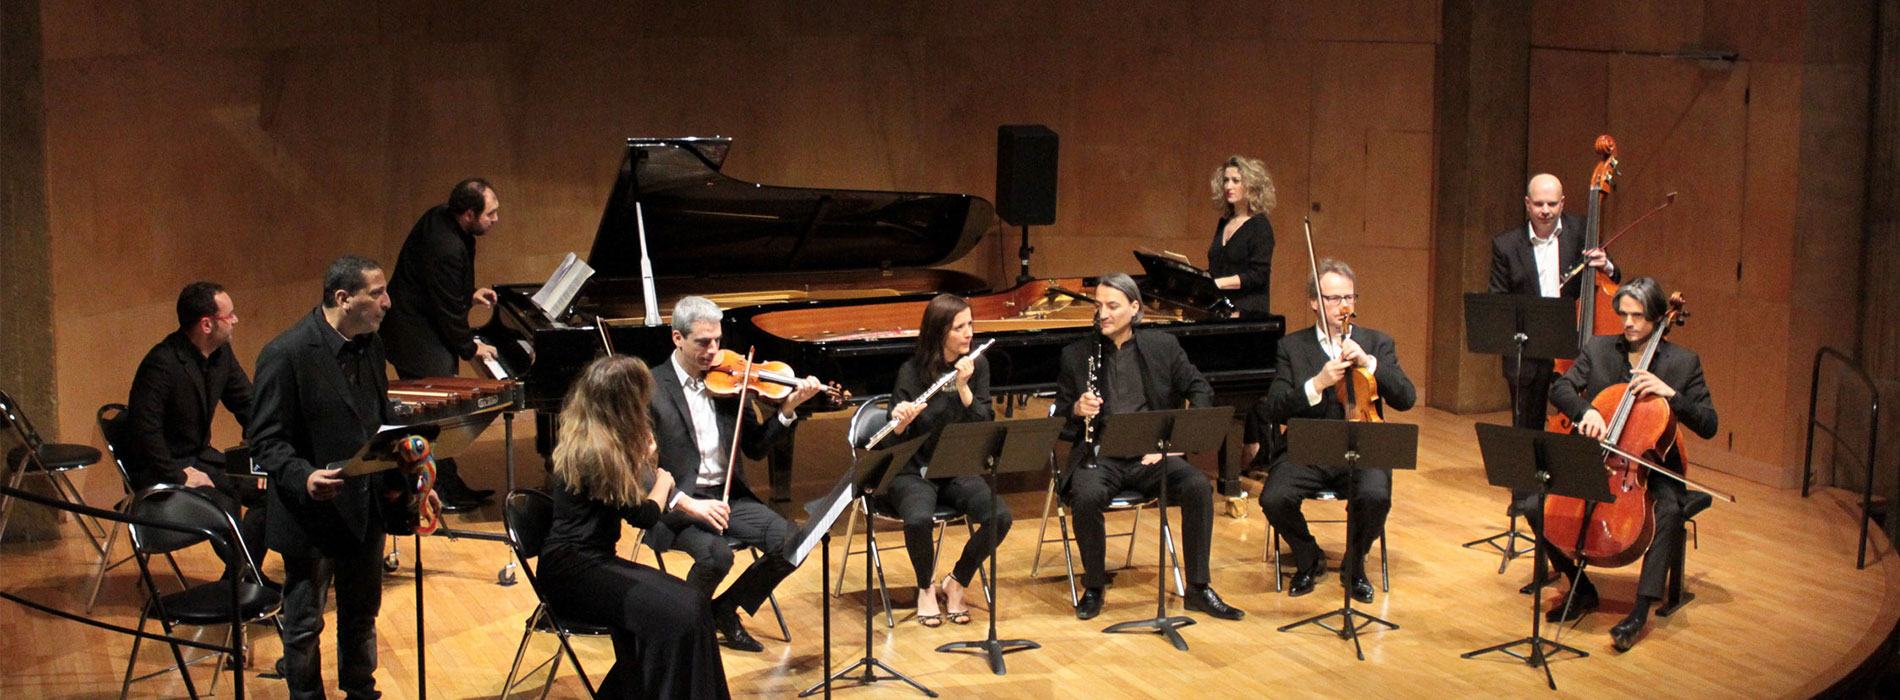 A look back on Laure Favre-Kahn & Friends concert